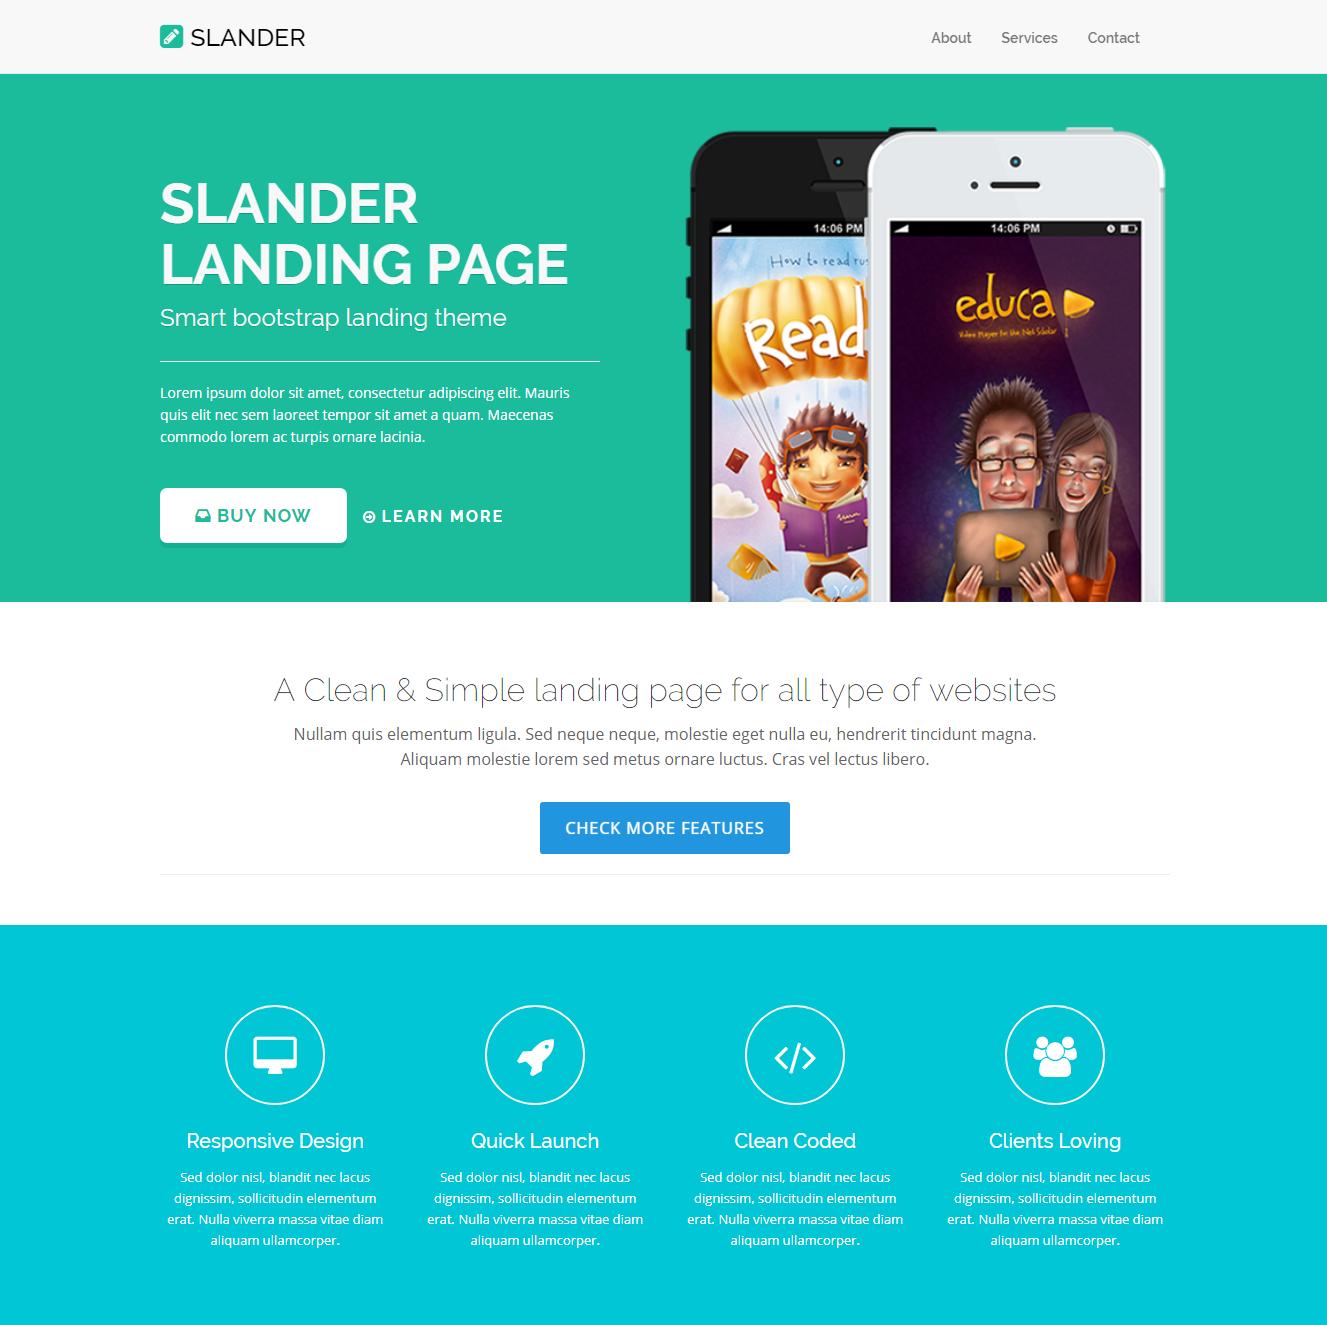 HTML5 Bootstrap Slander Themes